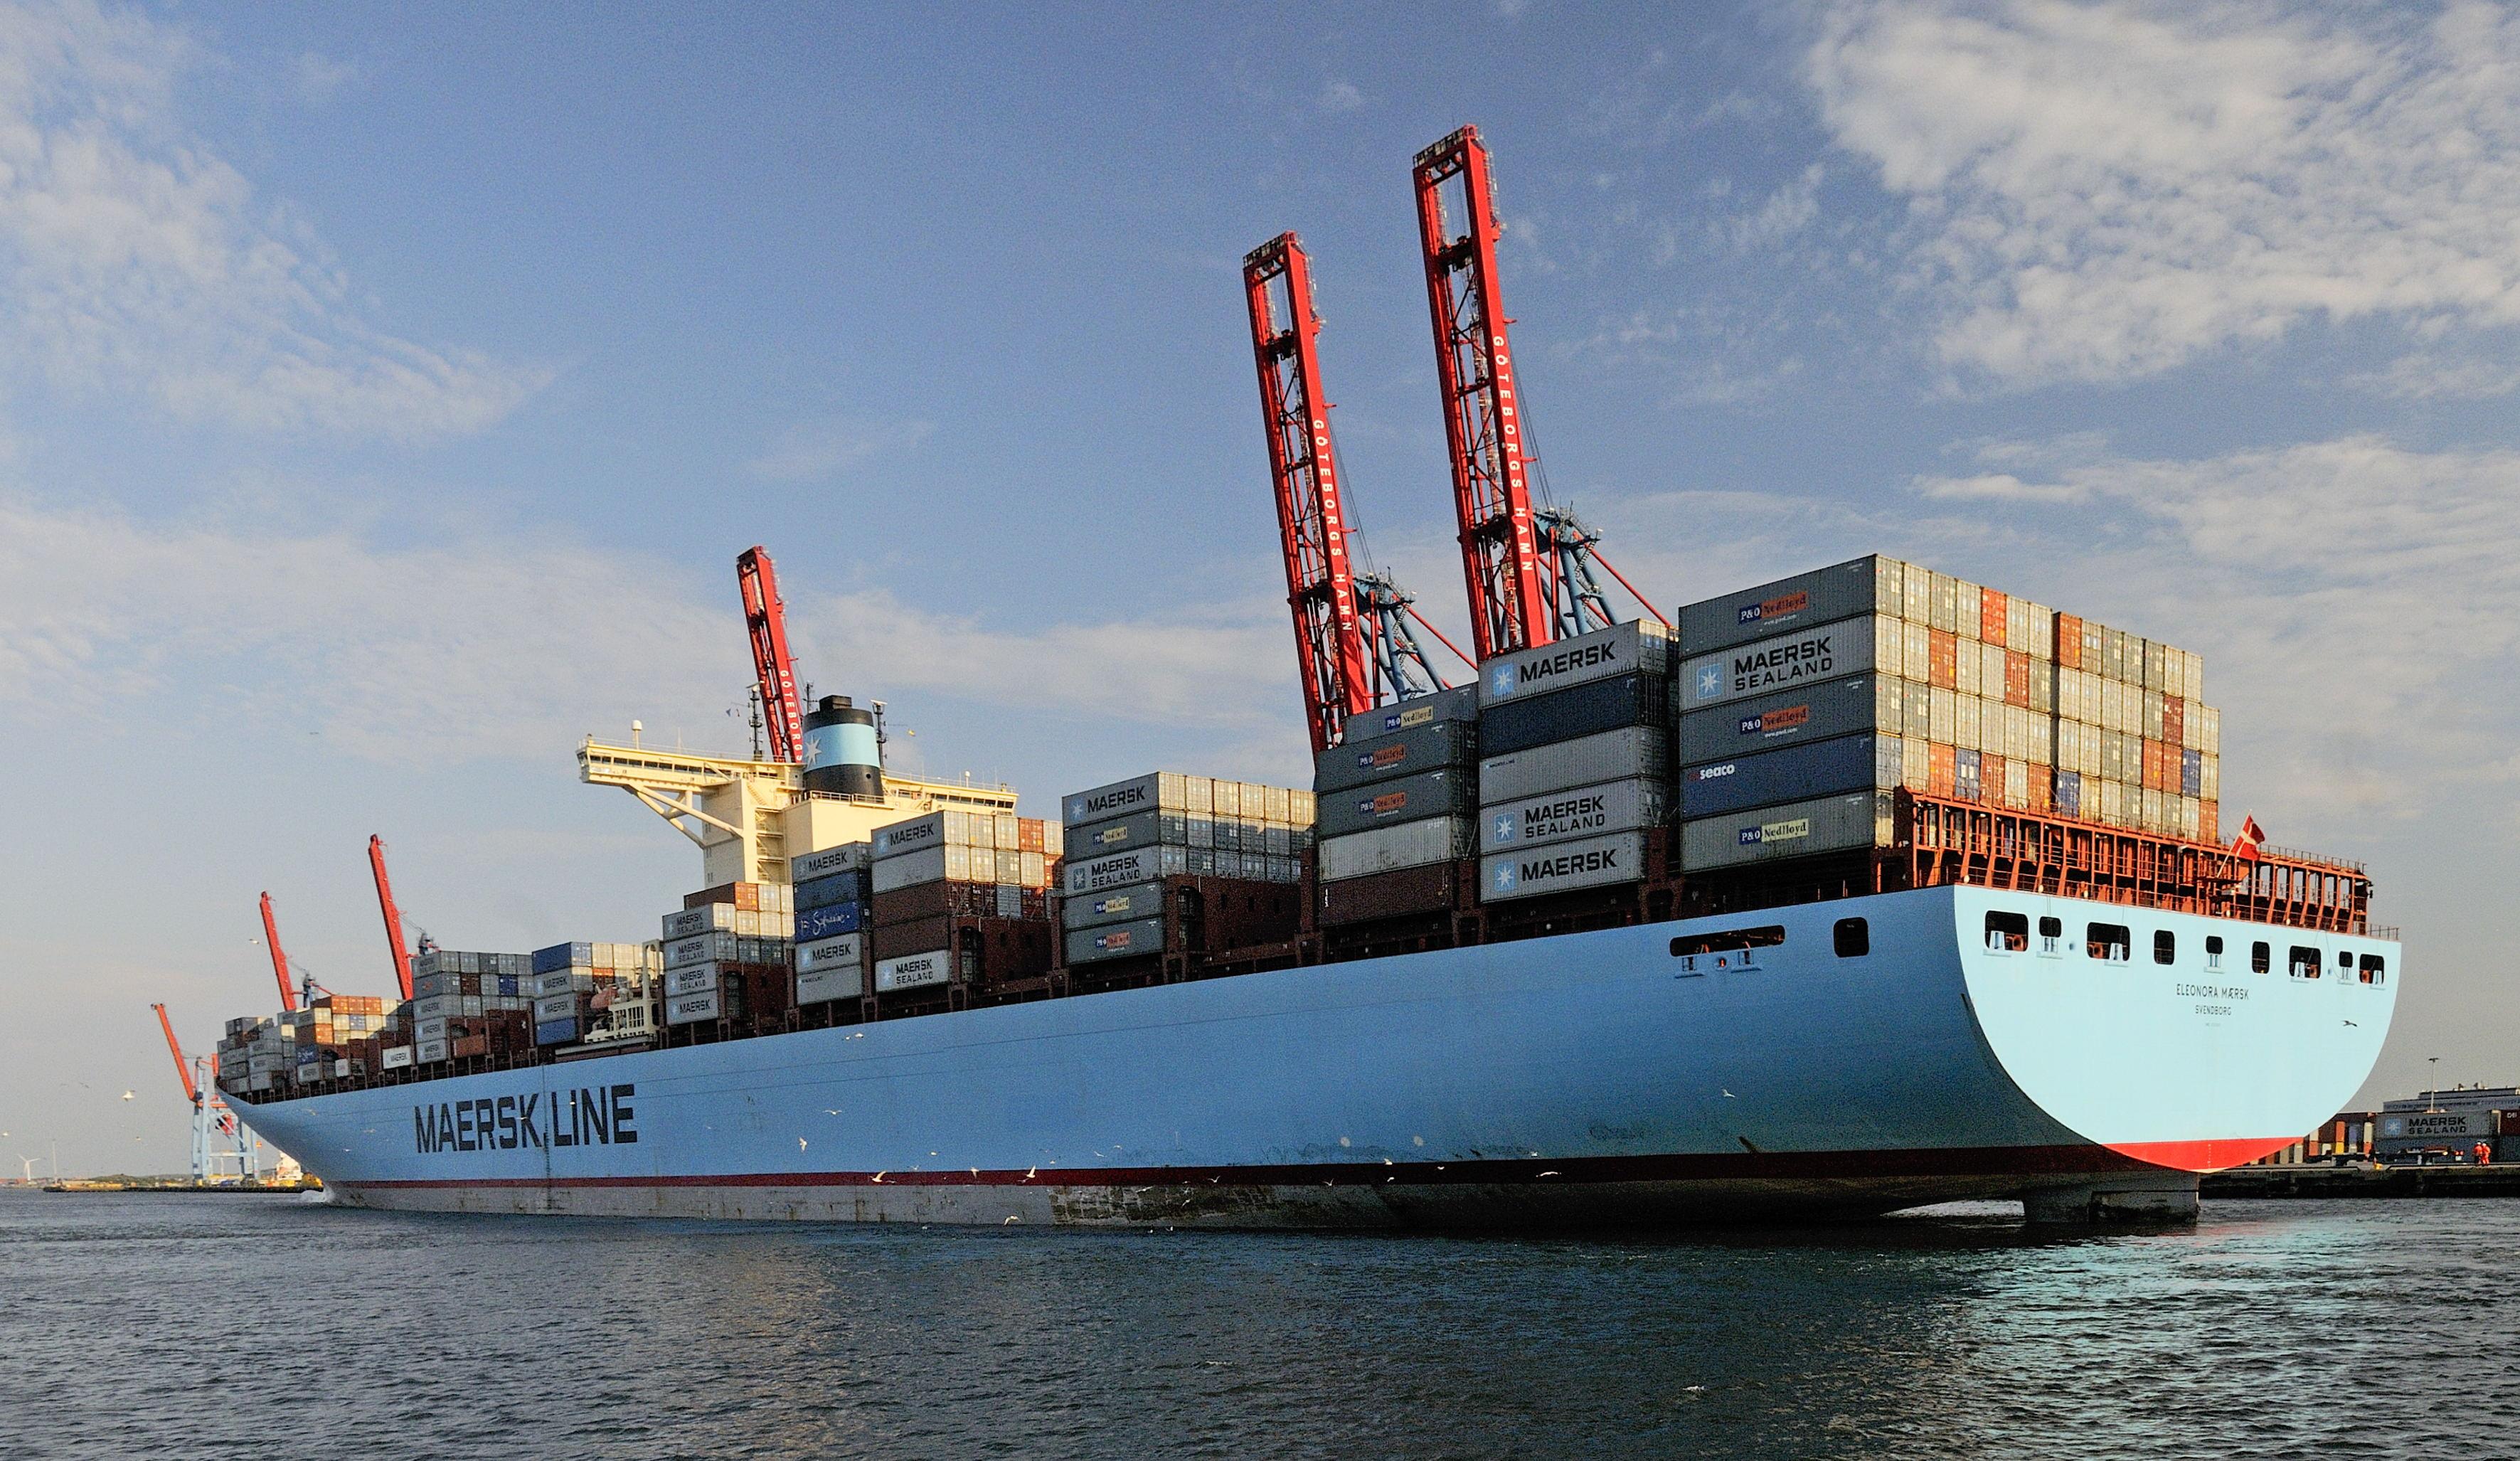 Varldens storsta containerfartyg till goteborg